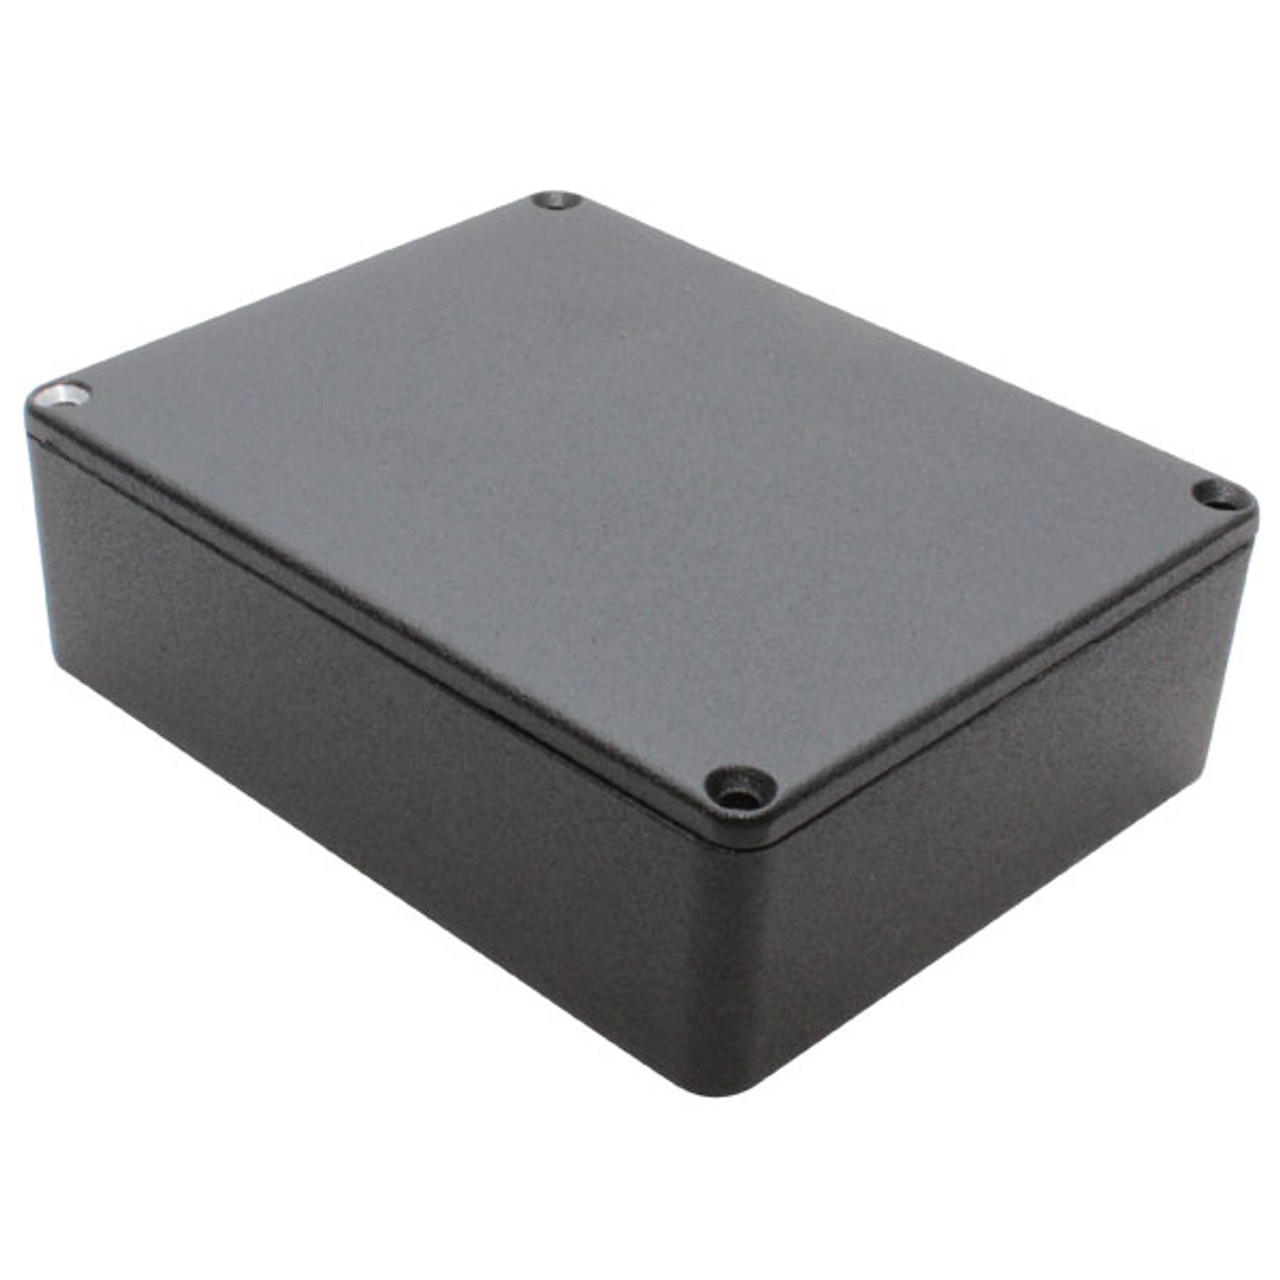 Hammond 1590XXBK - Mid-Large Black Pedal Enclosure